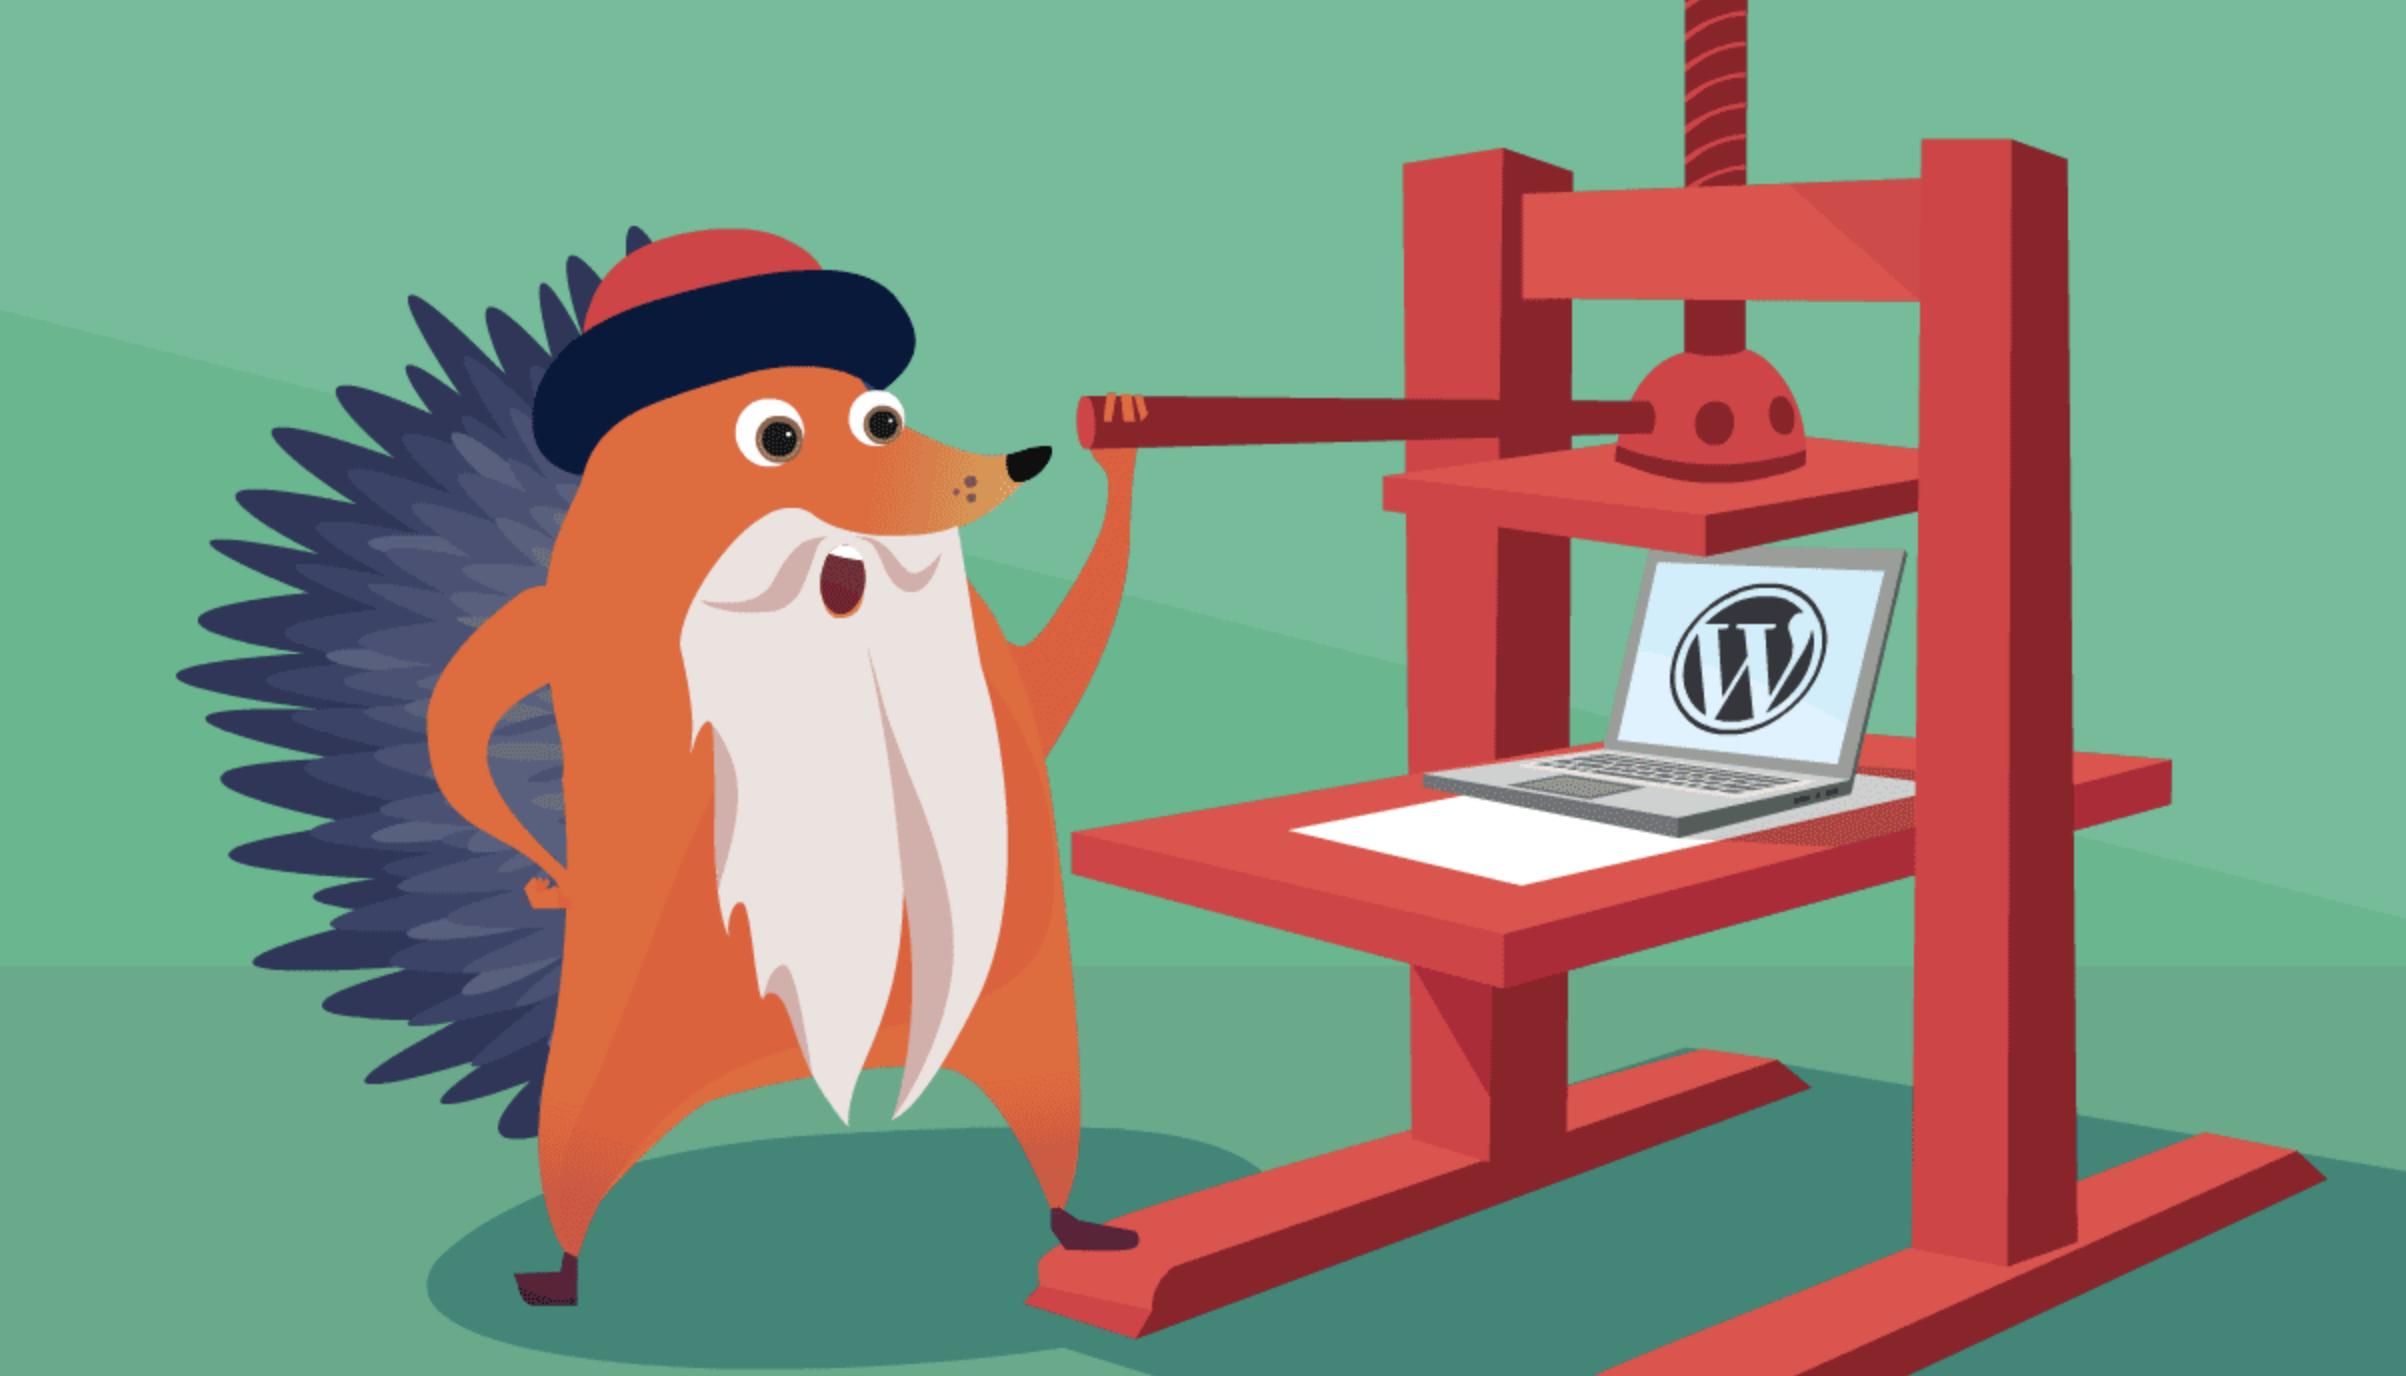 Gutenberg Hedgehog using a printing press with a laptop running WordPress